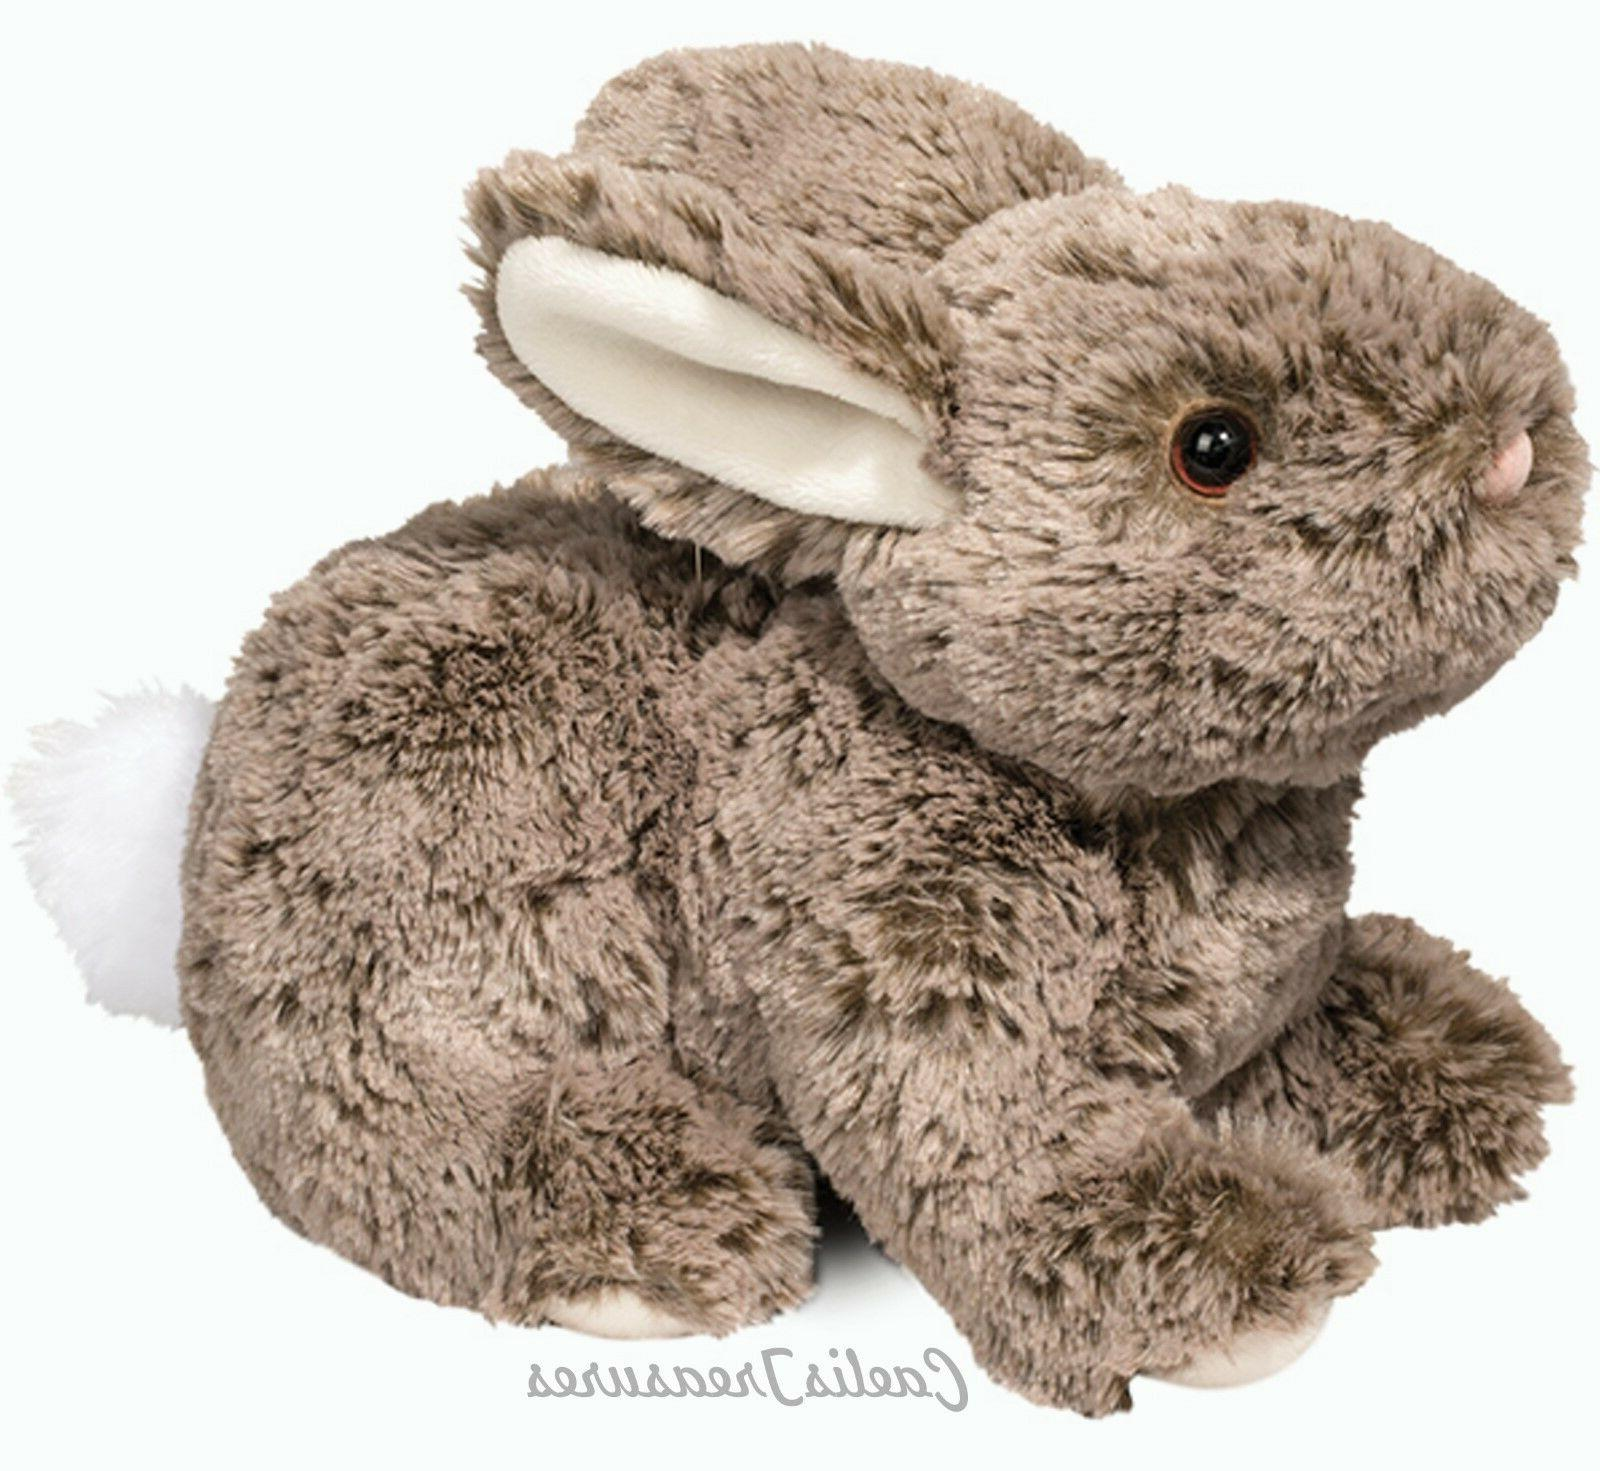 "Douglas Taylor 11"" Plush Stuffed Animal Cuddle"